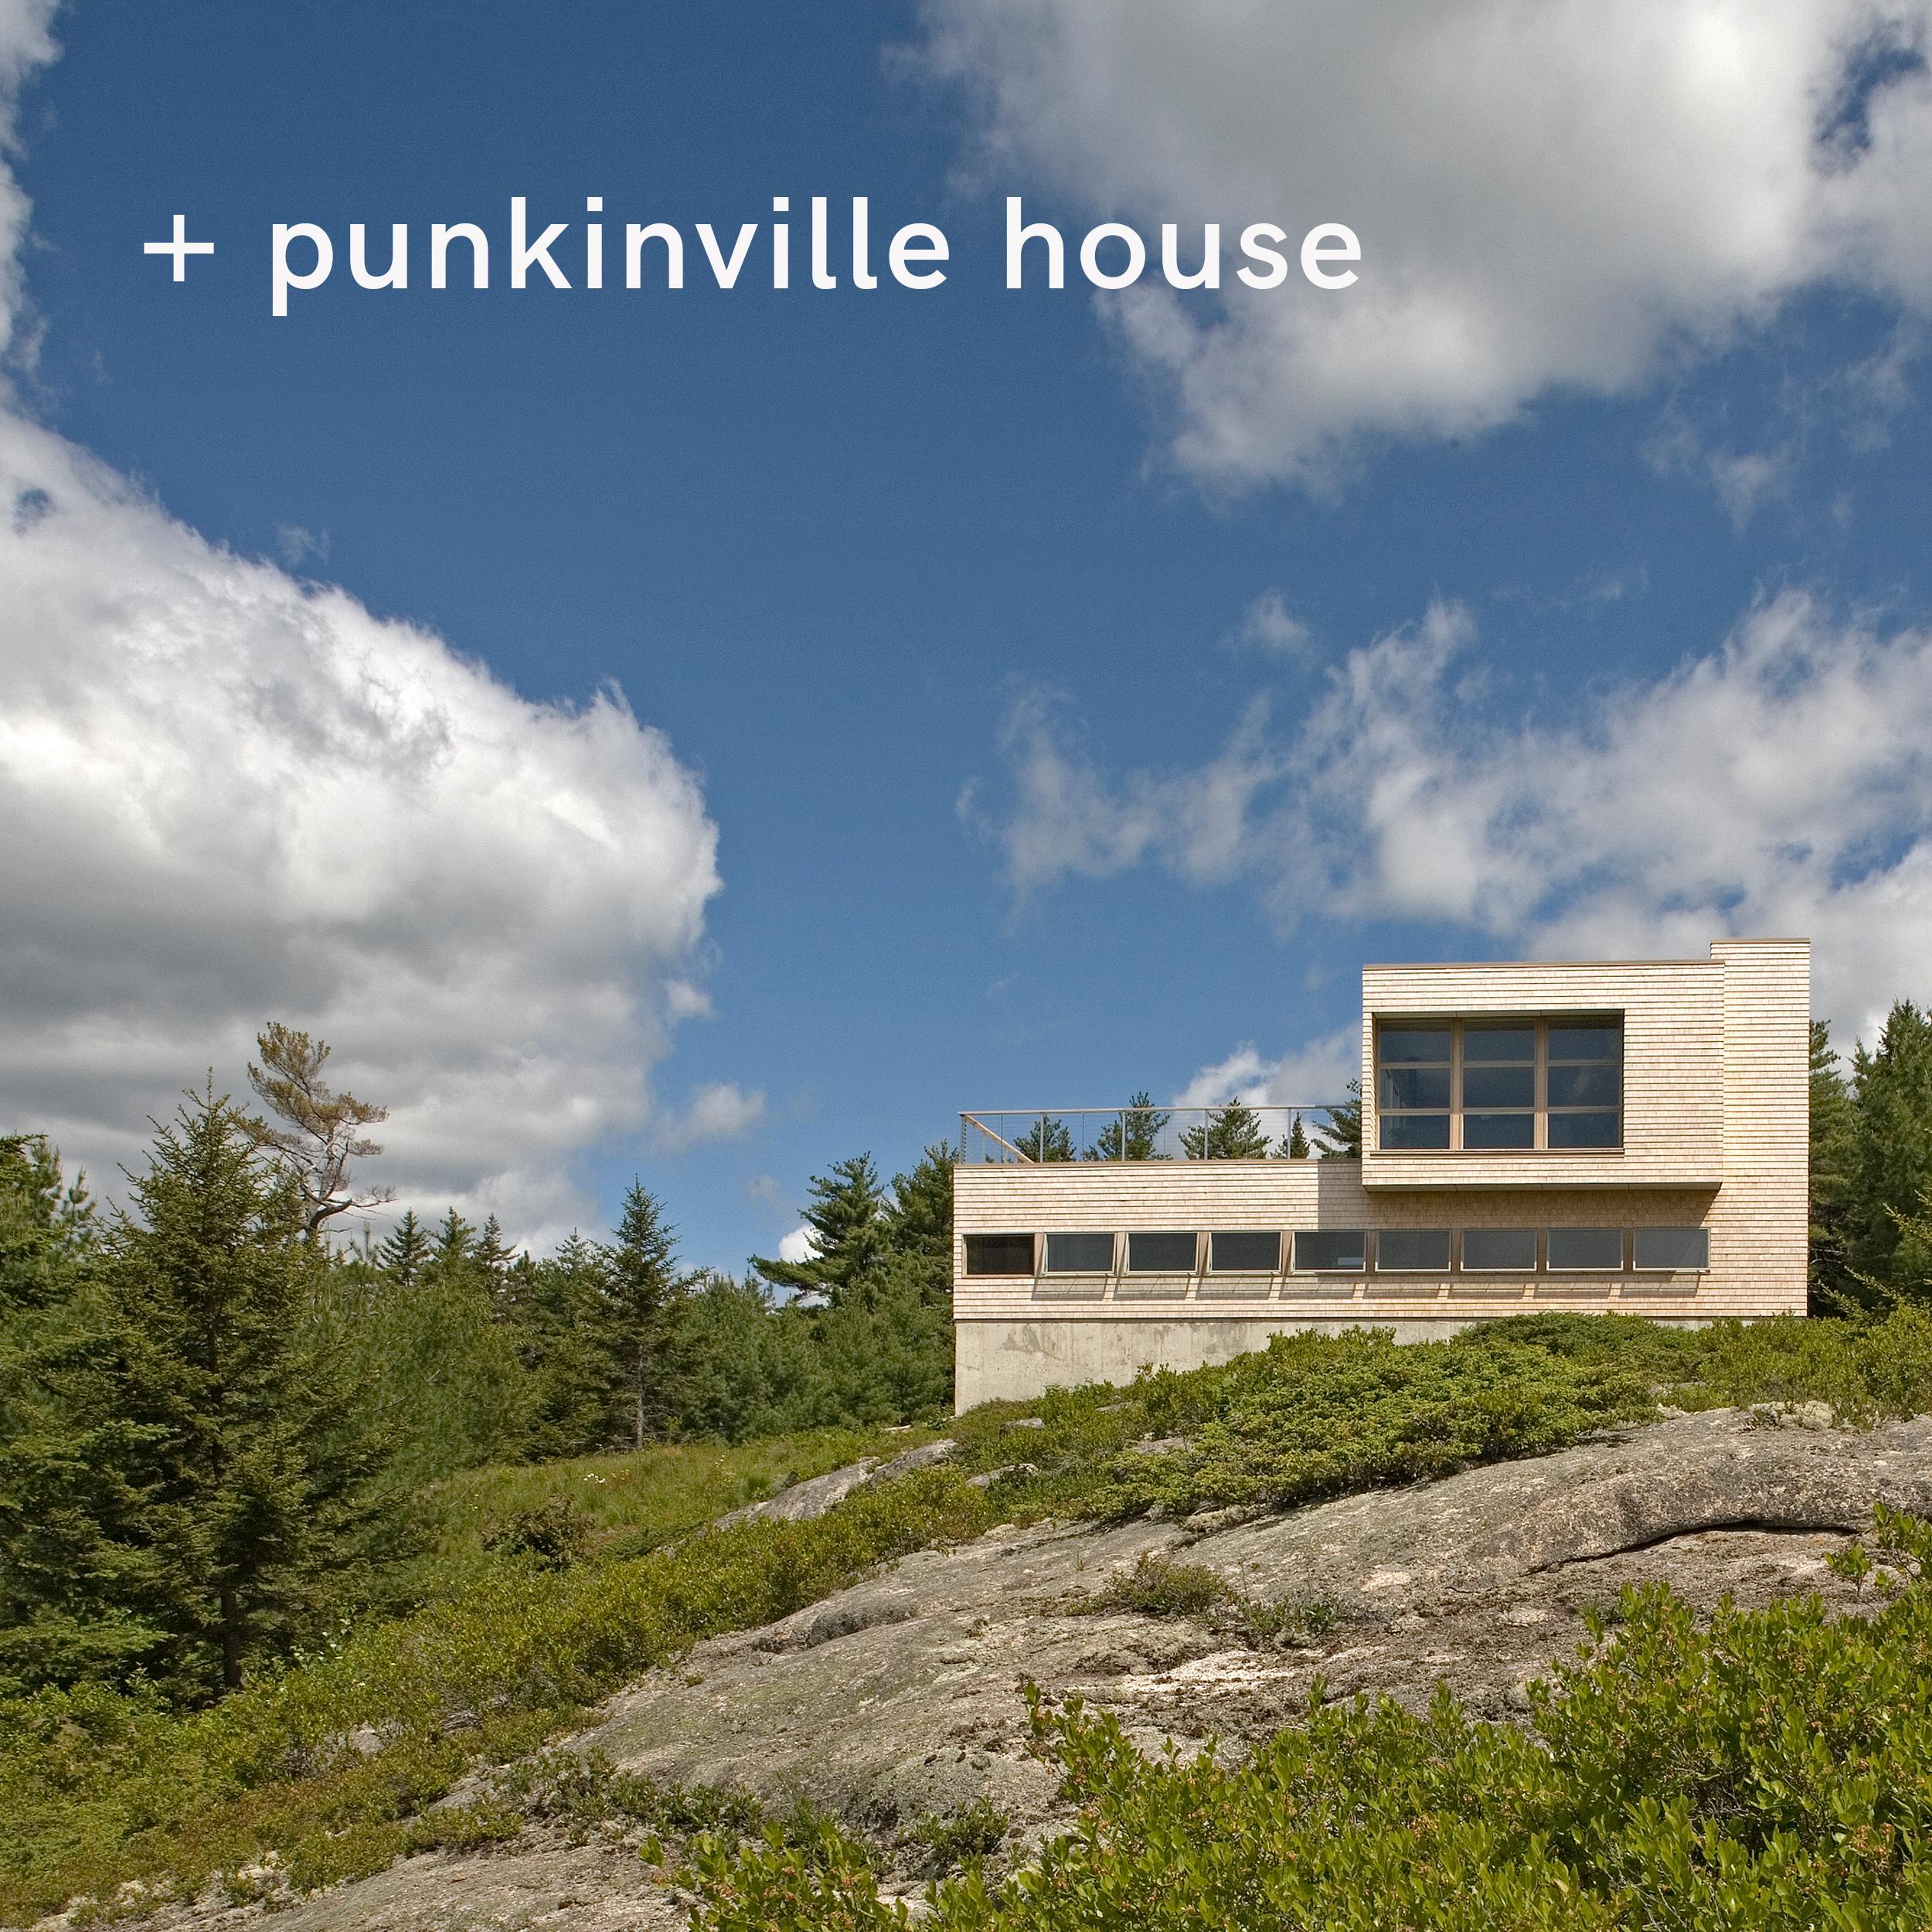 punkinville house.jpg